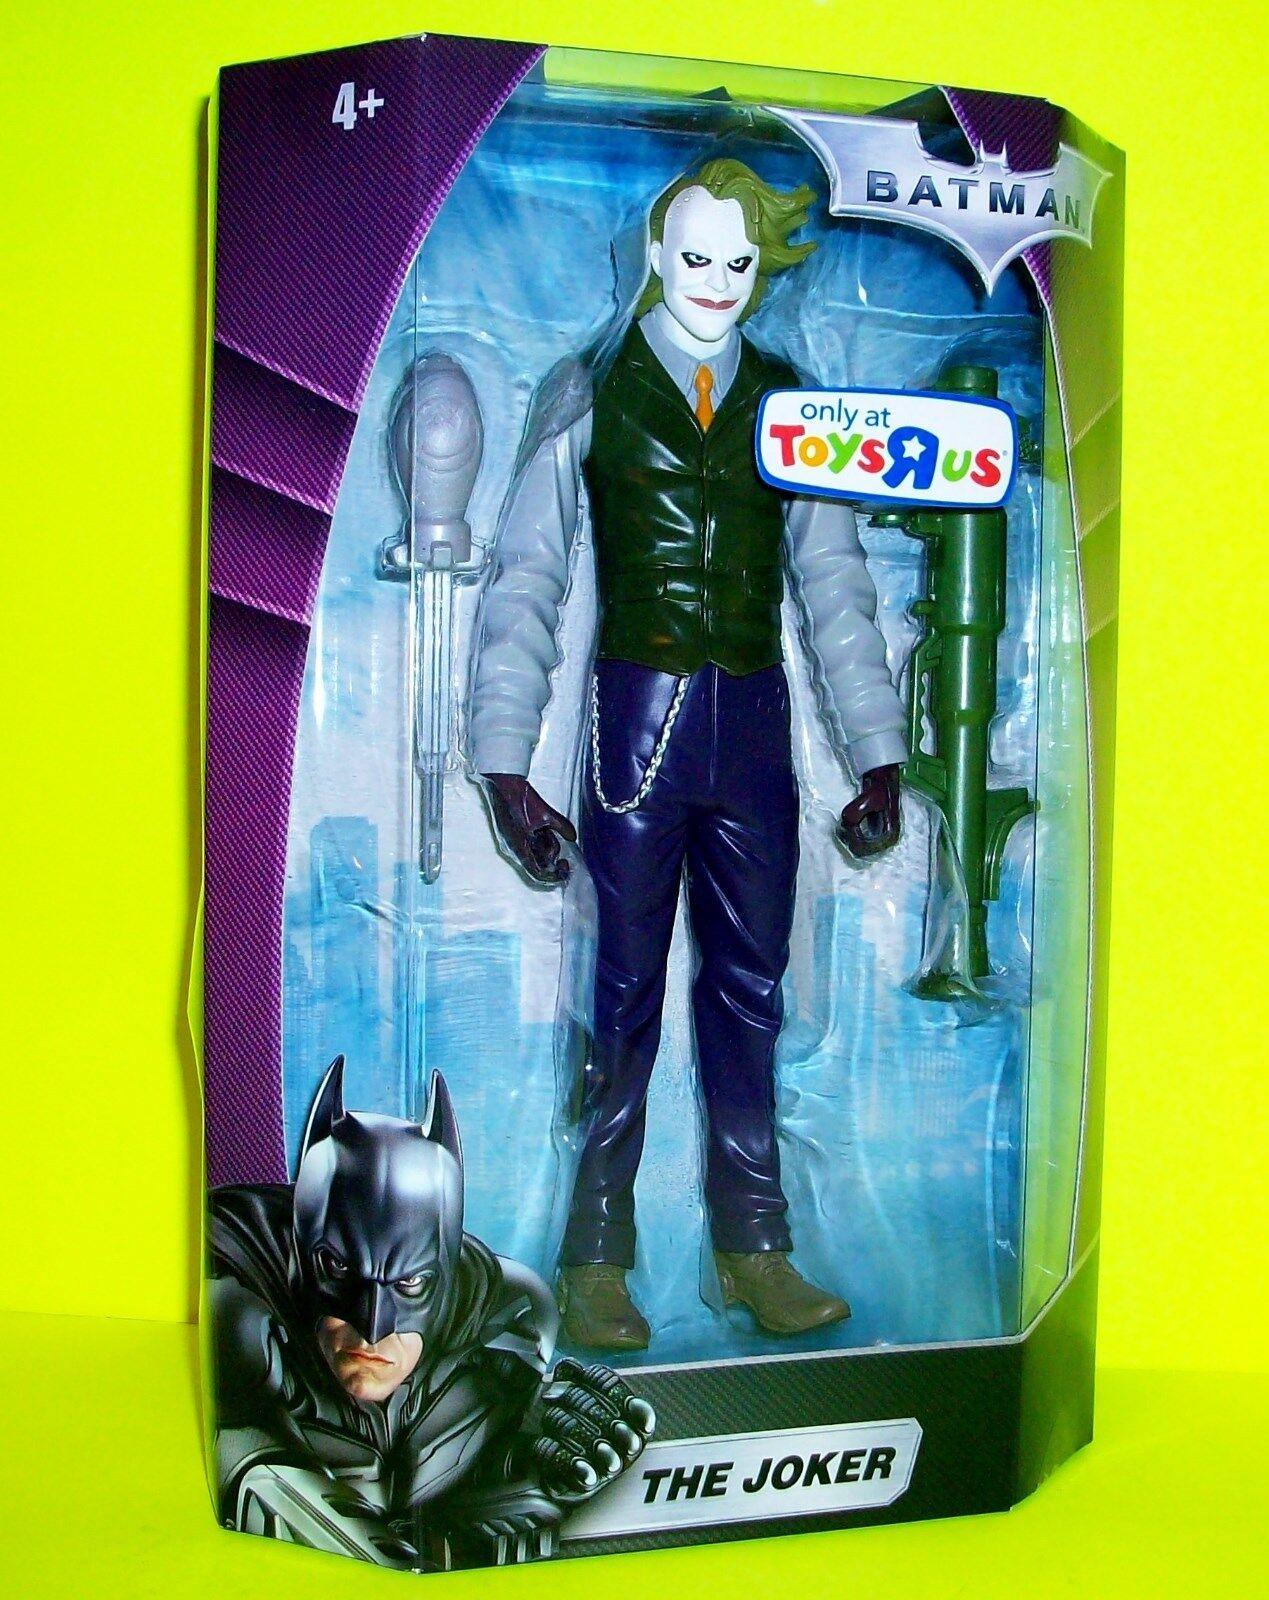 Batman The Dark Knight Joker Action Figure Toys R Us Heath Ledger Film Version